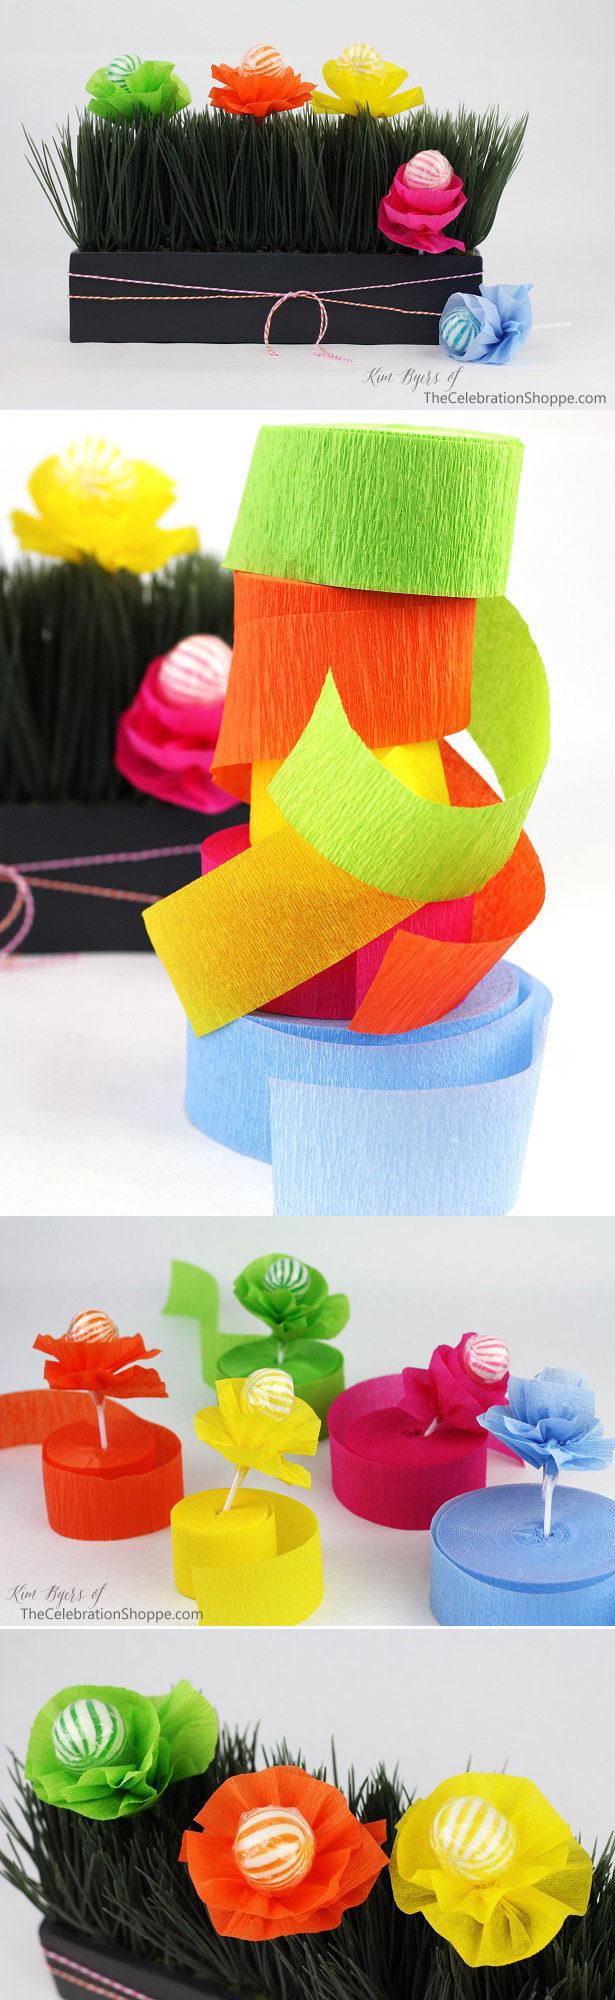 Crepe Paper Flower Lollipop Favor Tutorial   Kim Byers, TheCelebrationShoppe.com